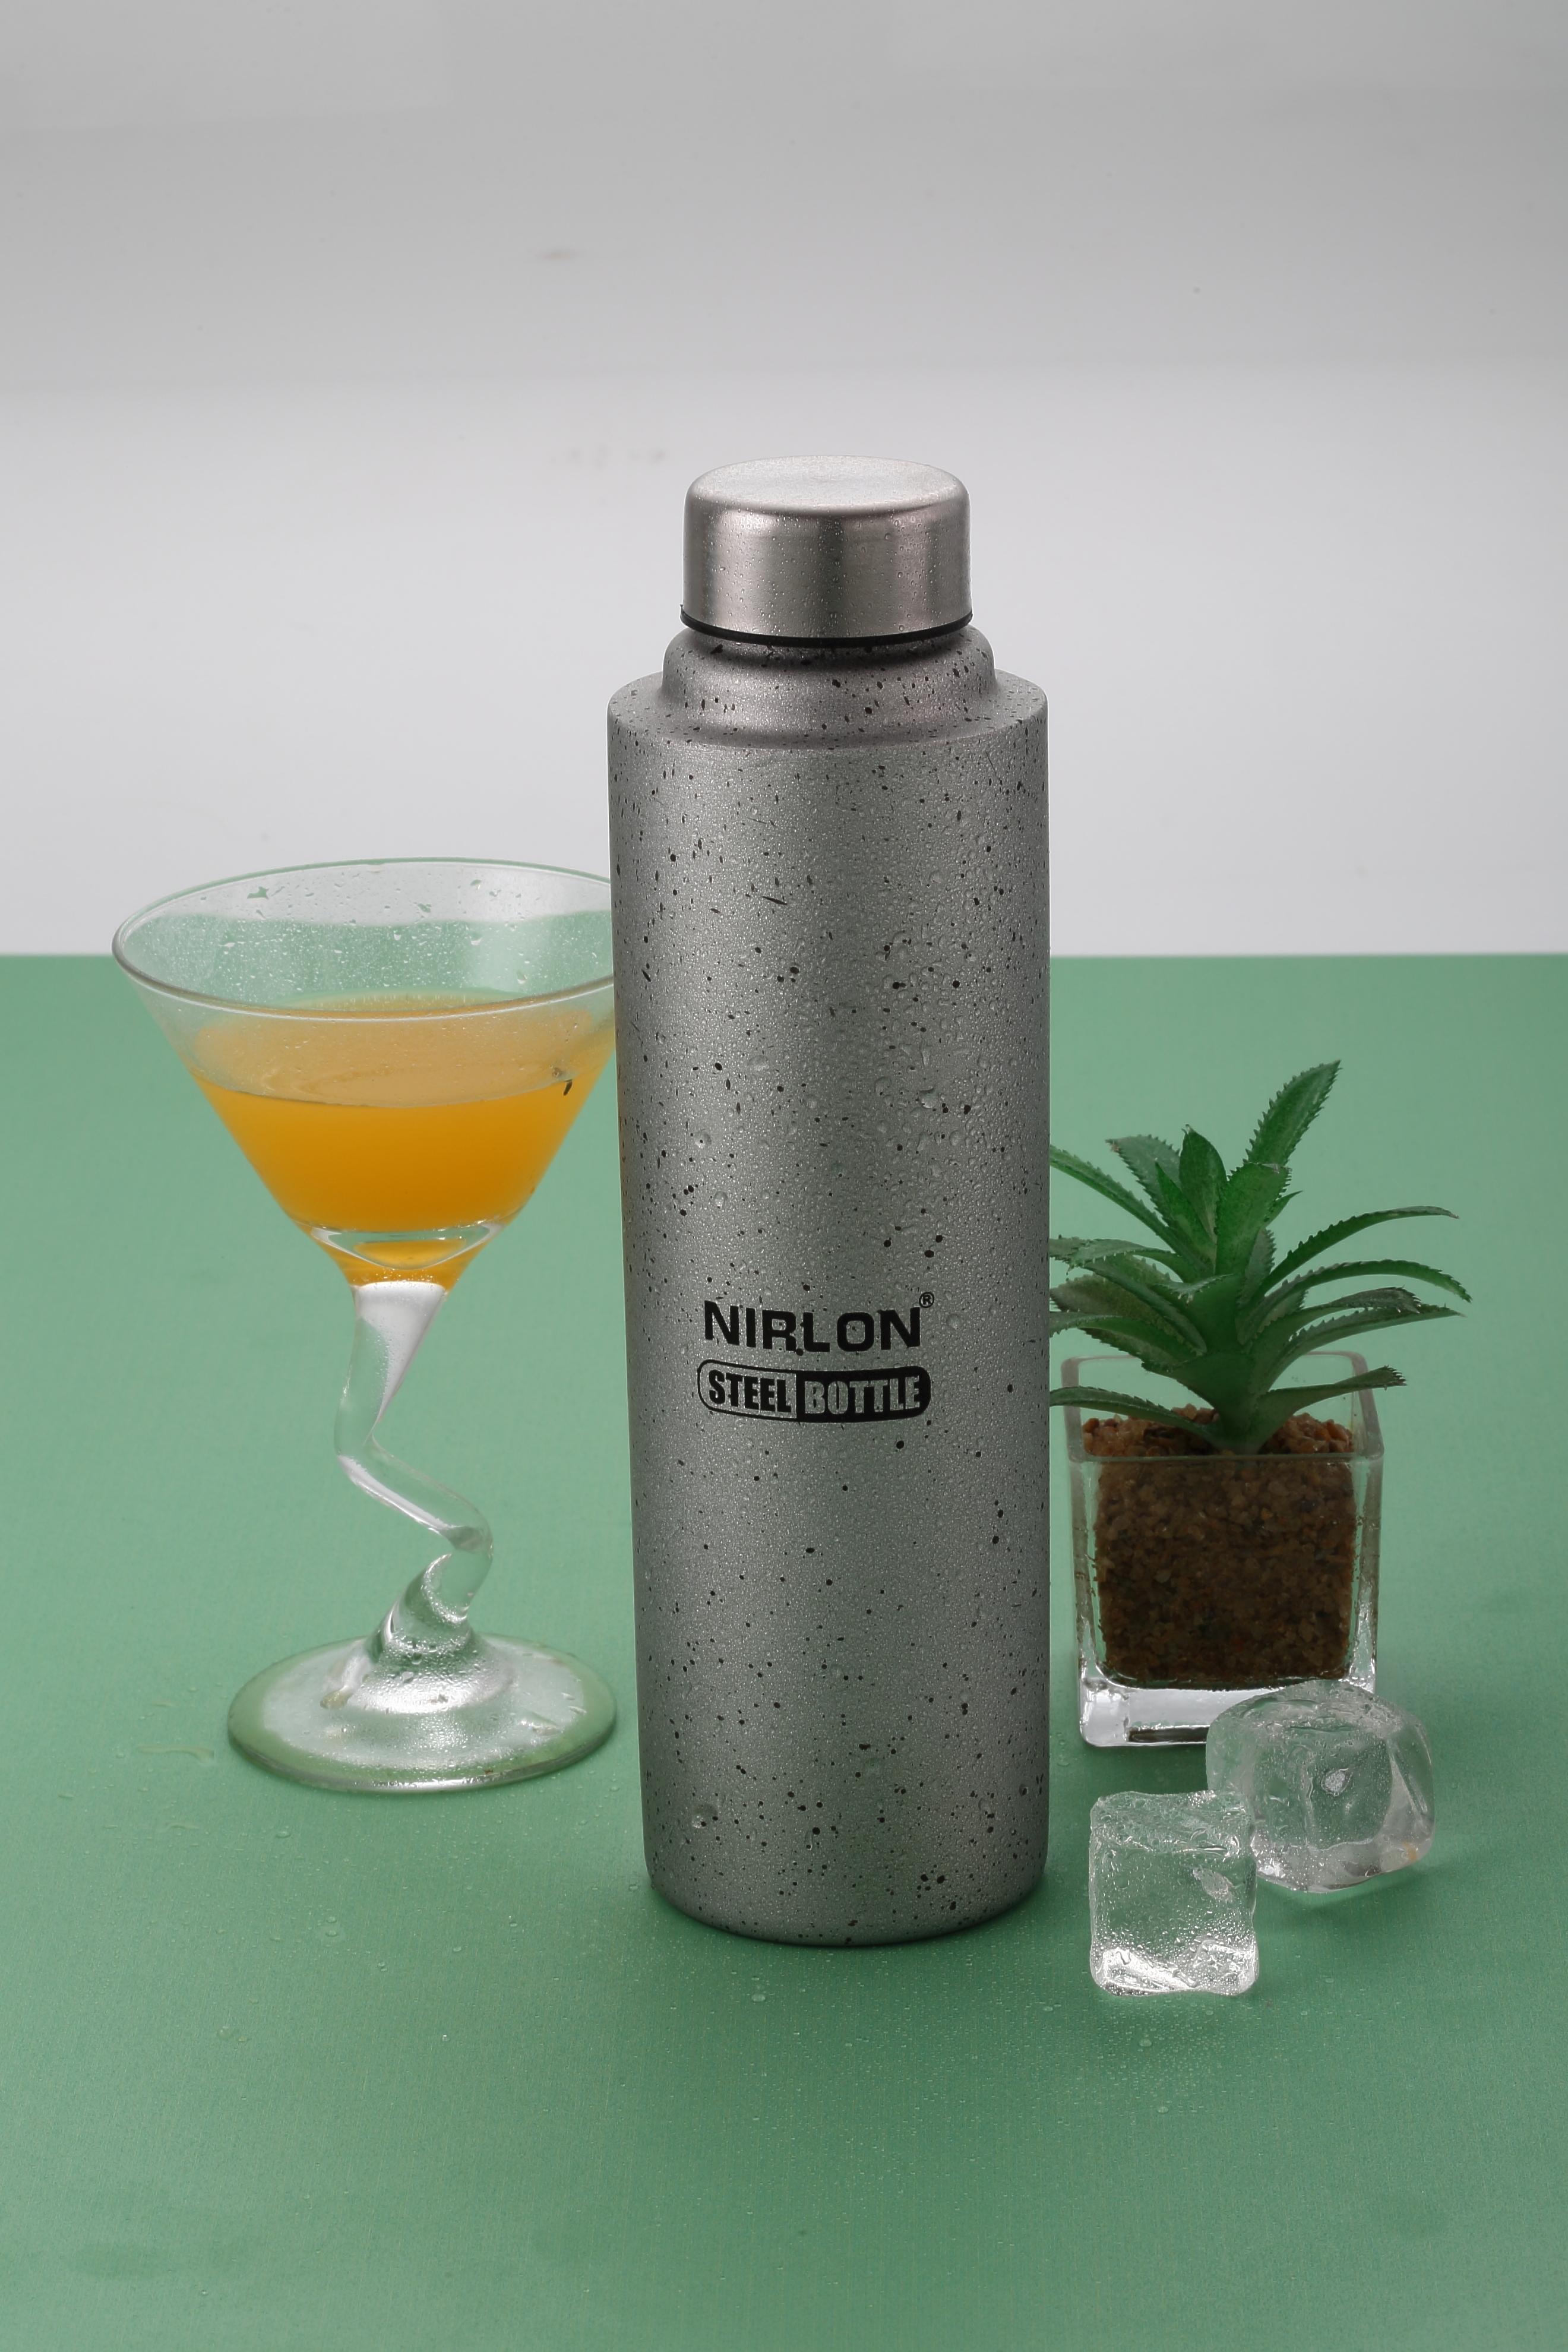 Stainless Steel Bottle